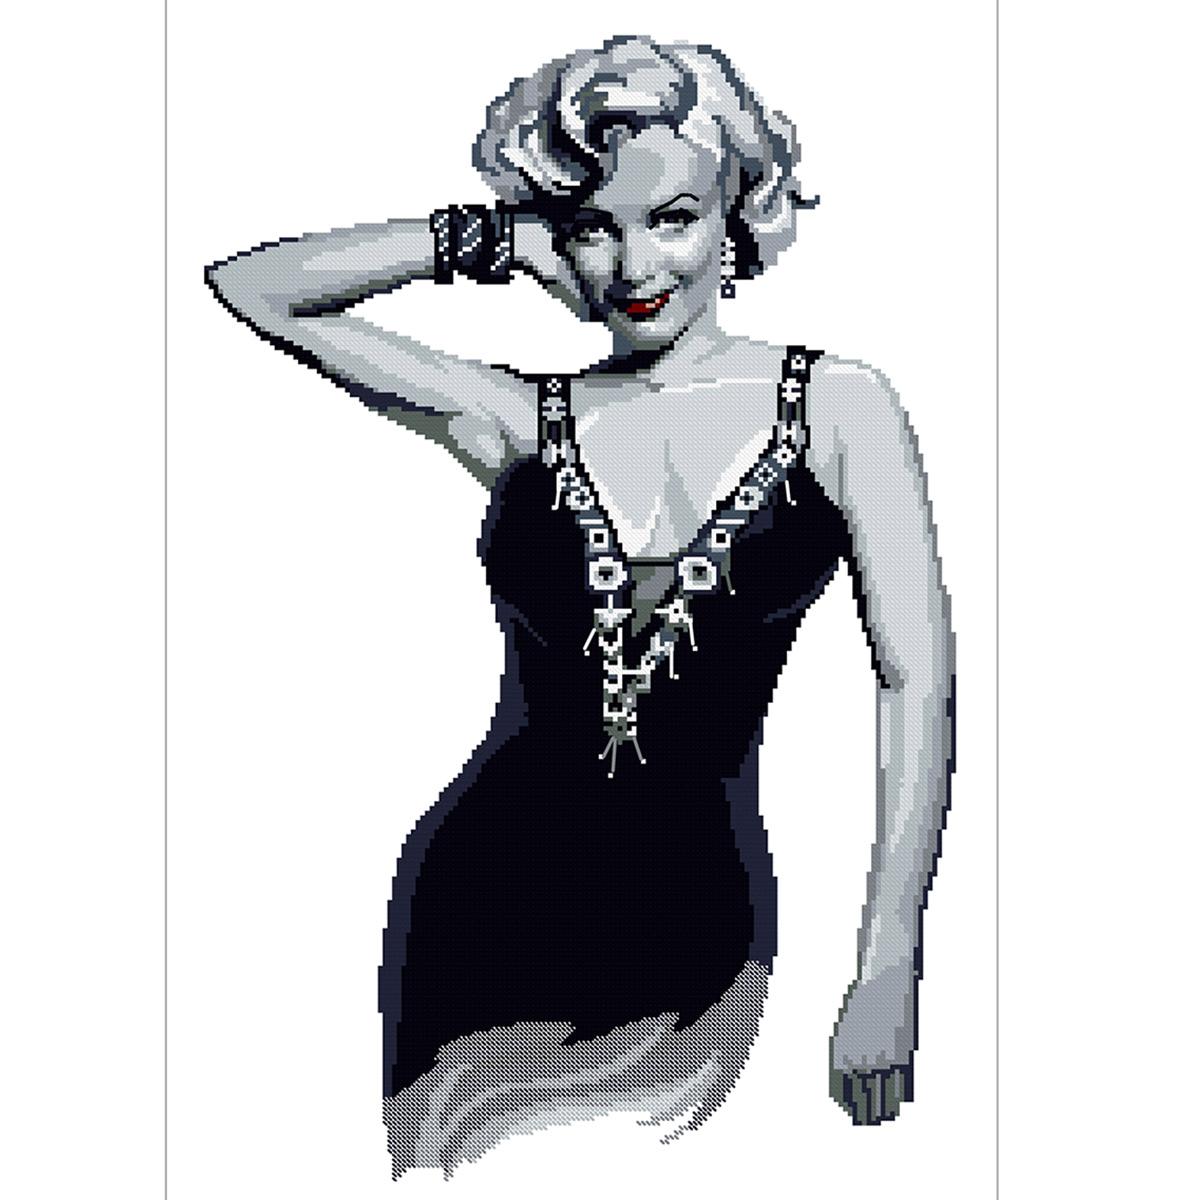 0077 Набор для вышивания Nitex 'Мэрлин Монро', 29*44 см